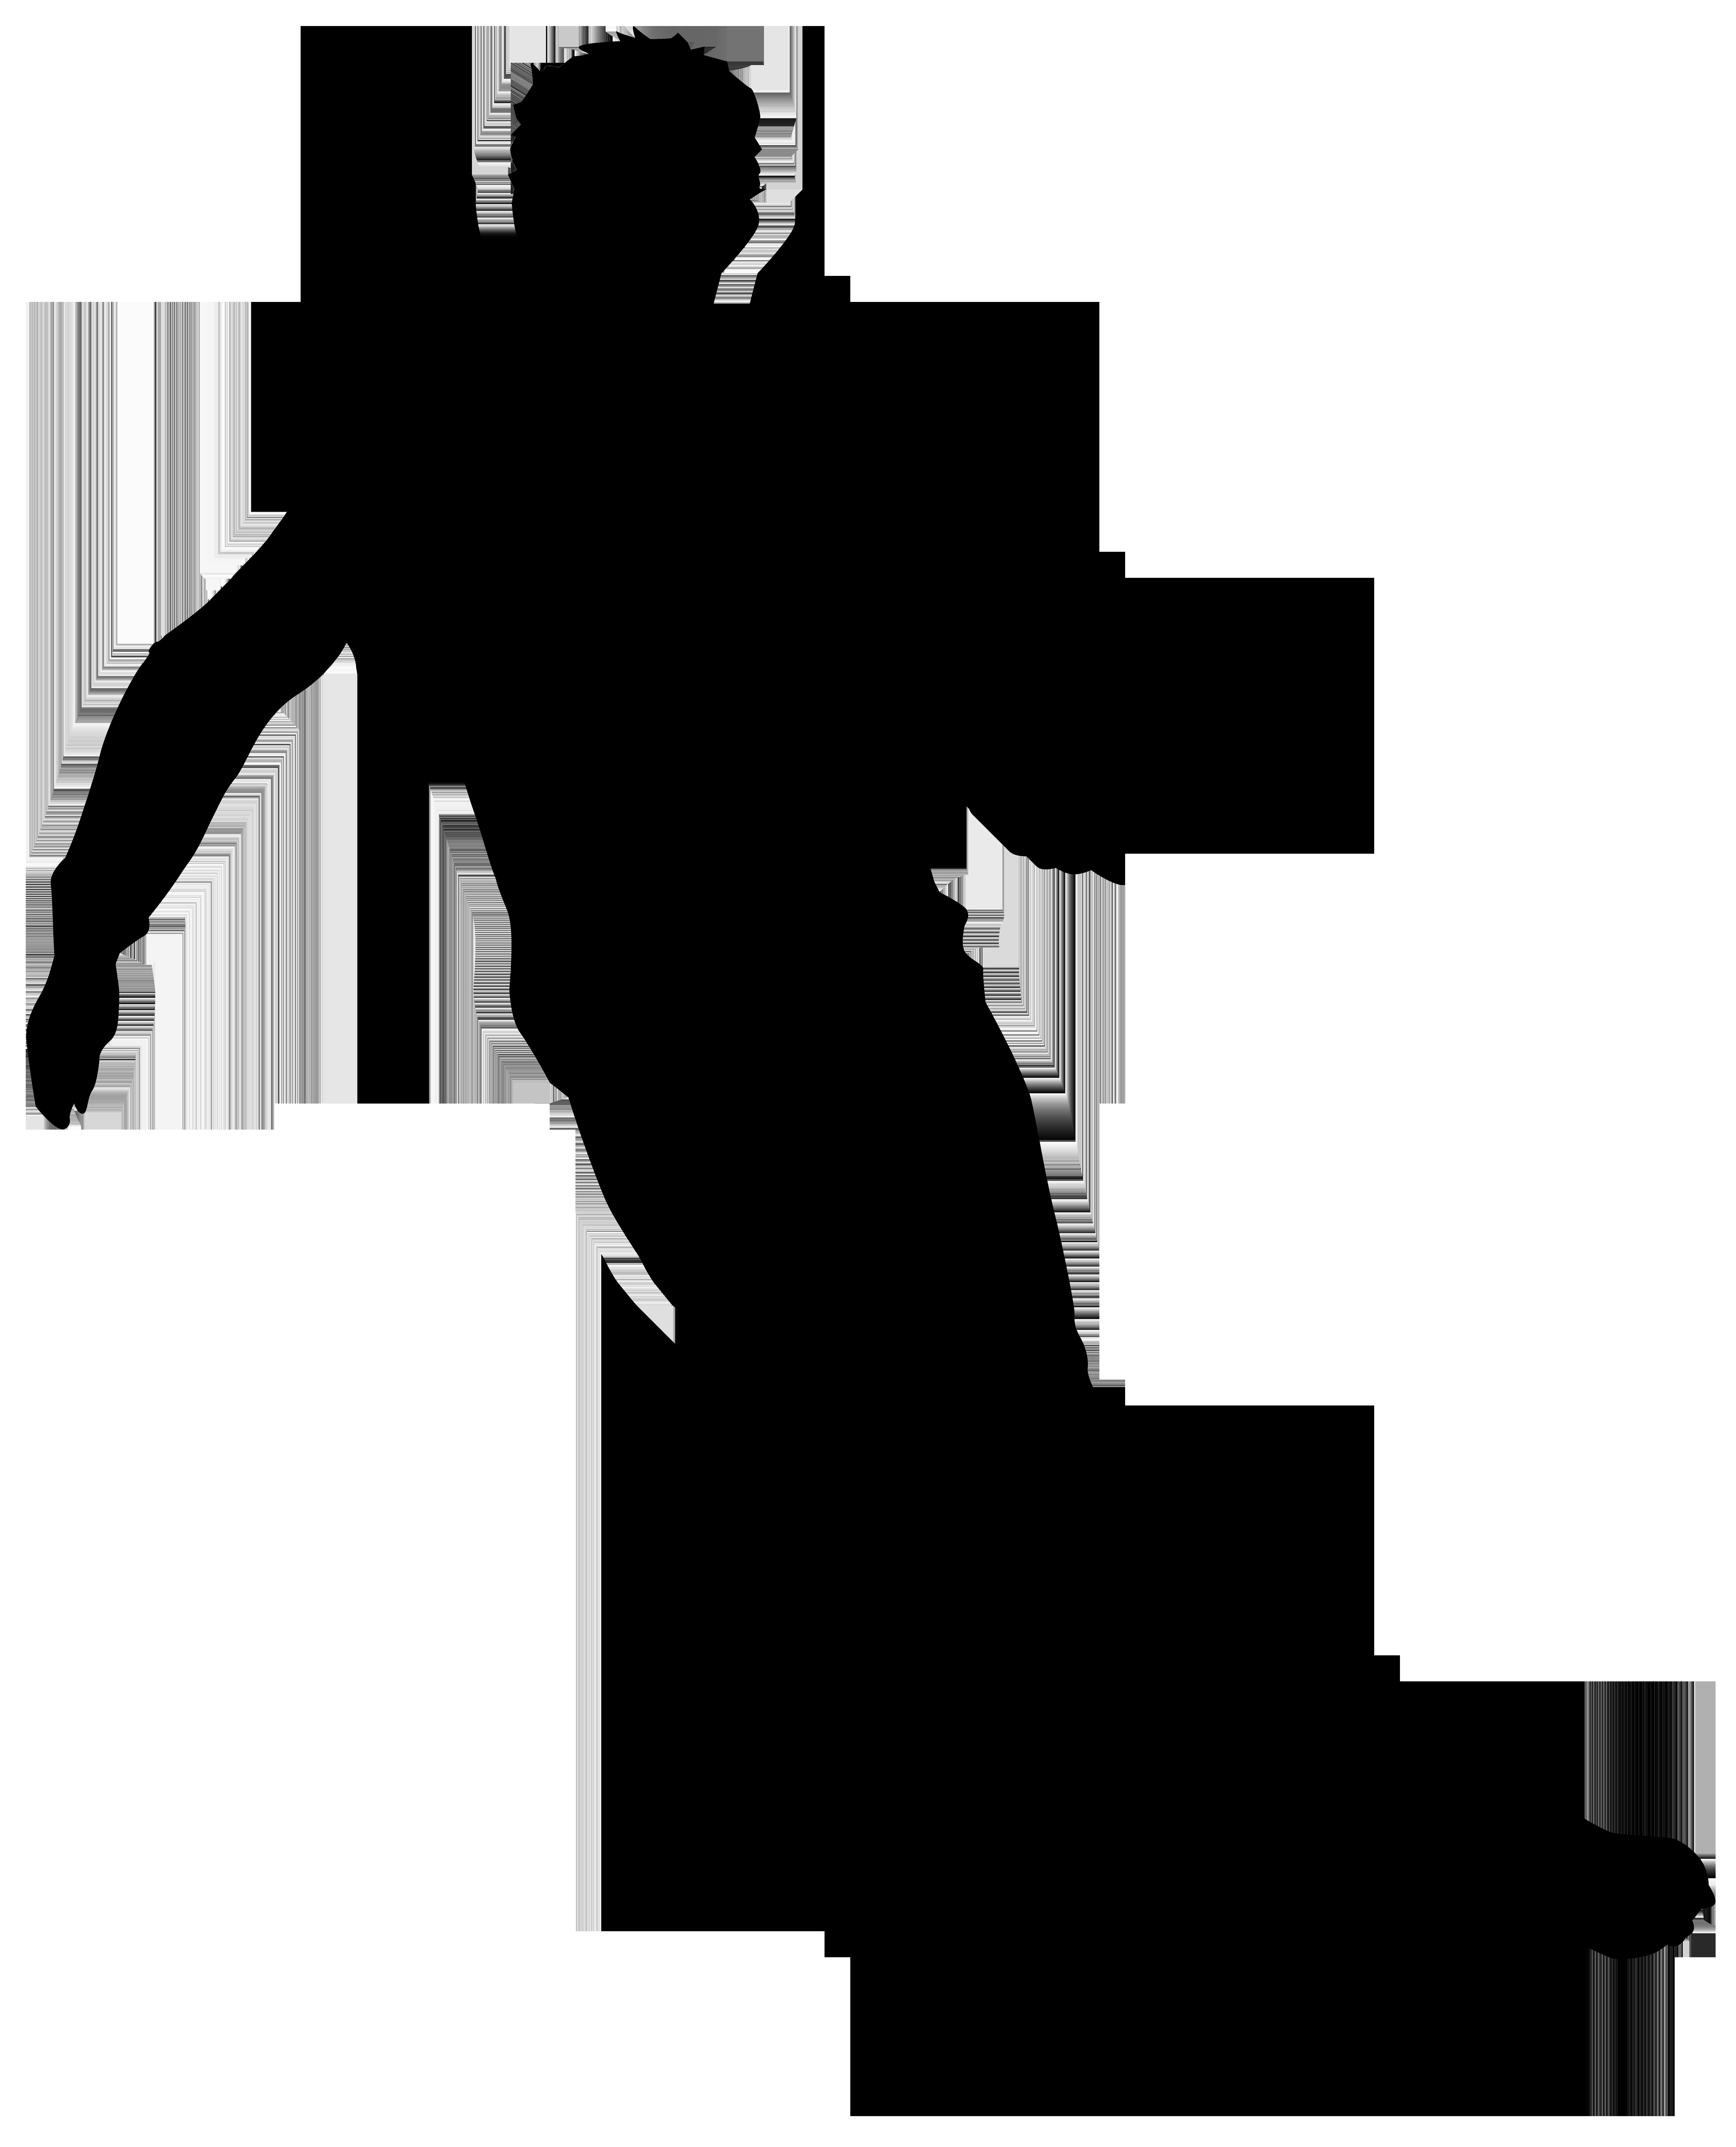 6468x8000 Football Player Silhouette Png Clip Art Imageu200b Gallery